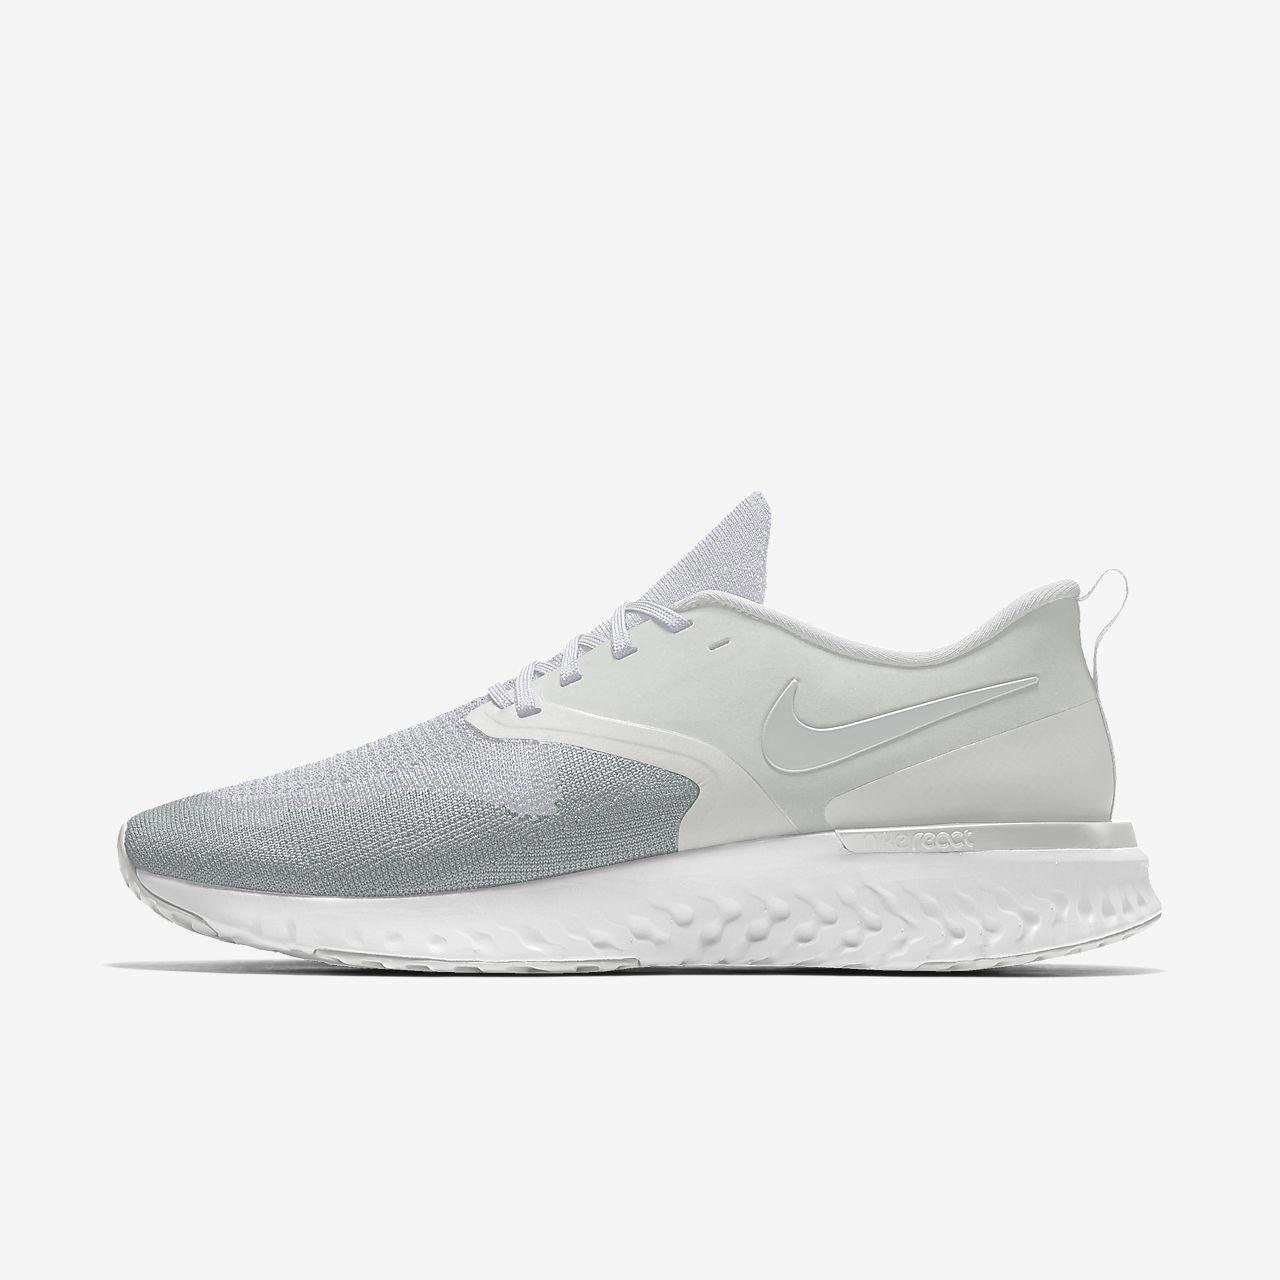 Nike Odyssey React 2 Flyknit By You Custom Men's Running Shoe